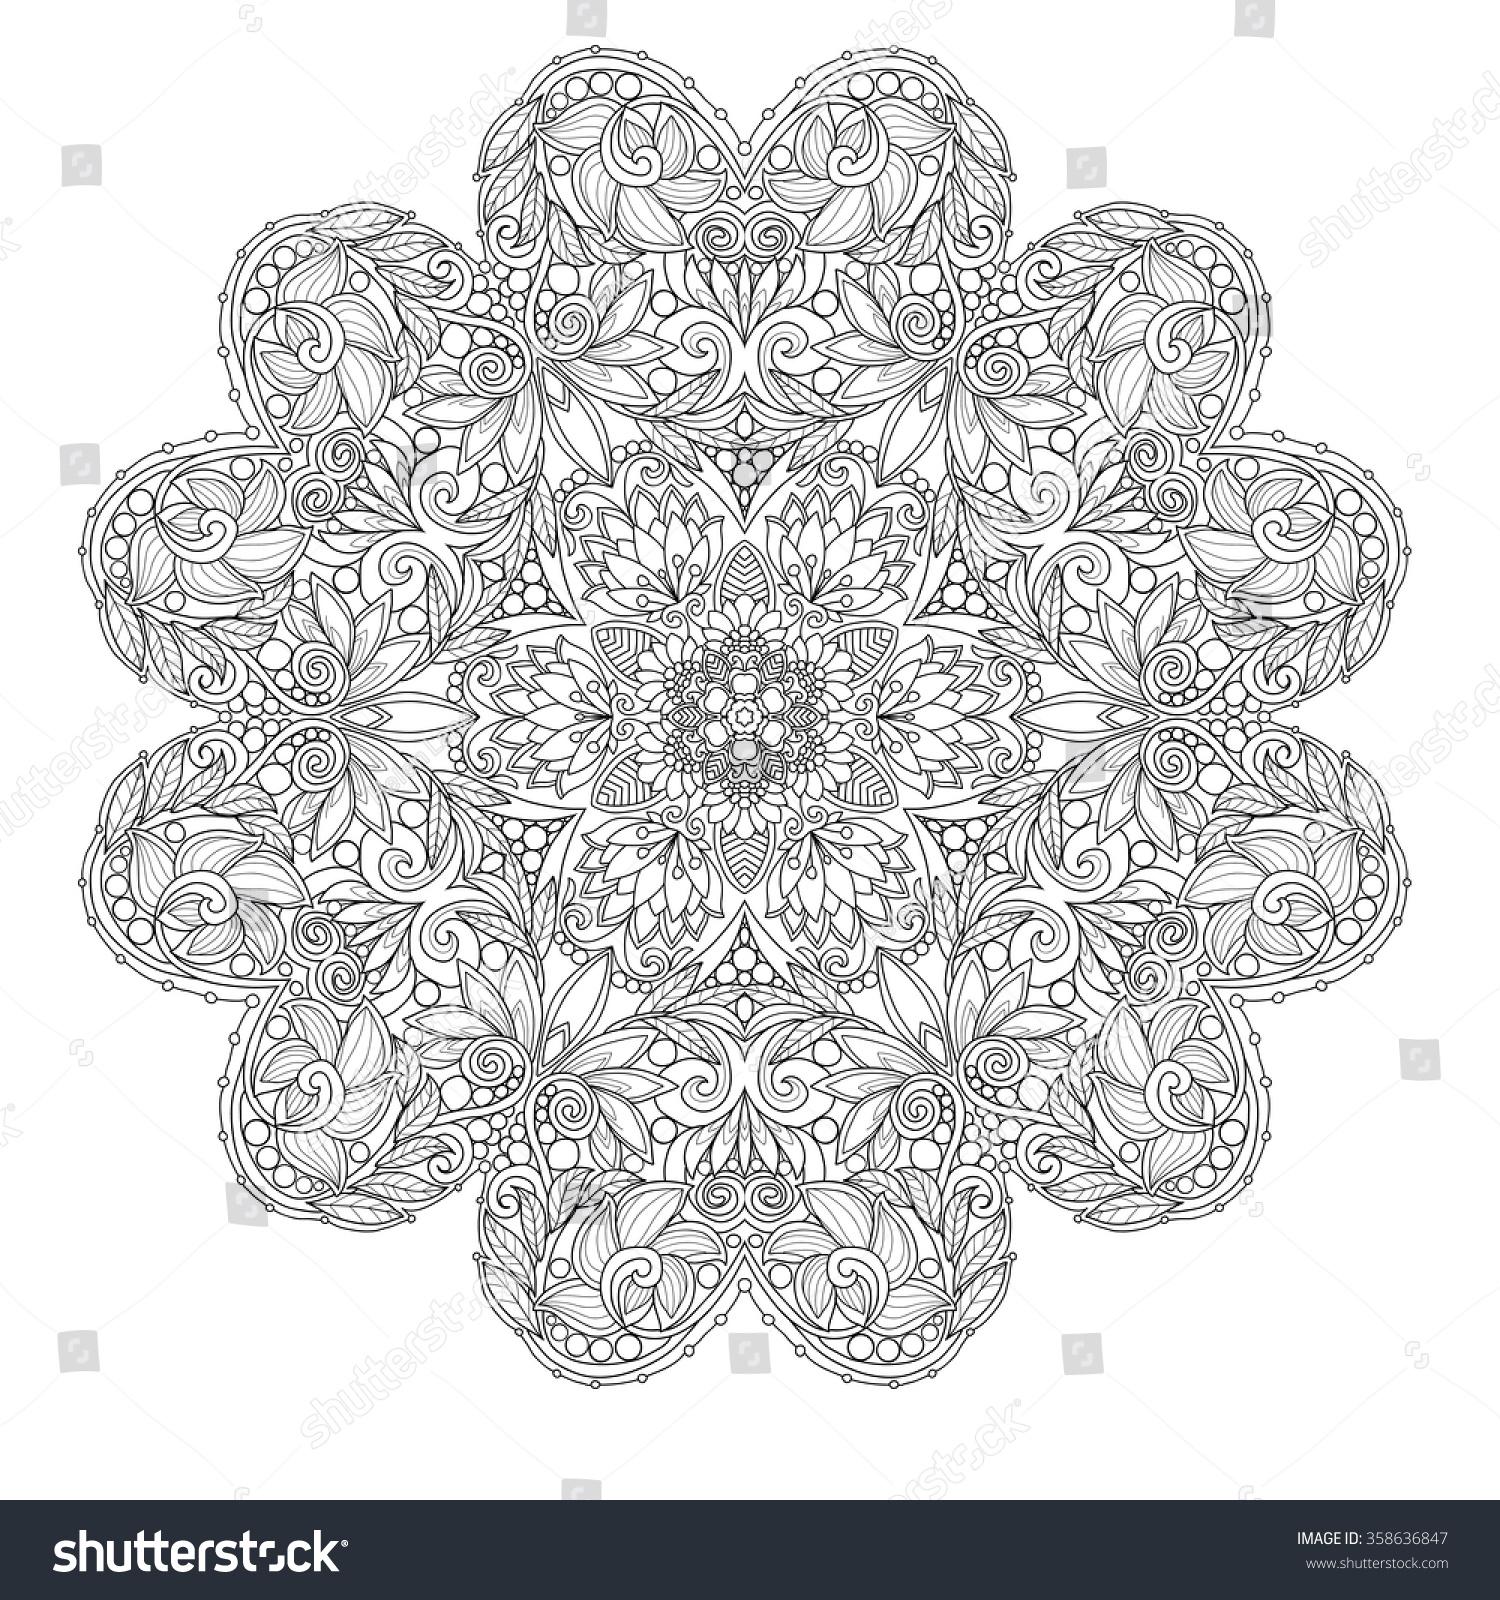 Decorative Mandala Love Hearts Coloring Book Stock Photo (Photo ...